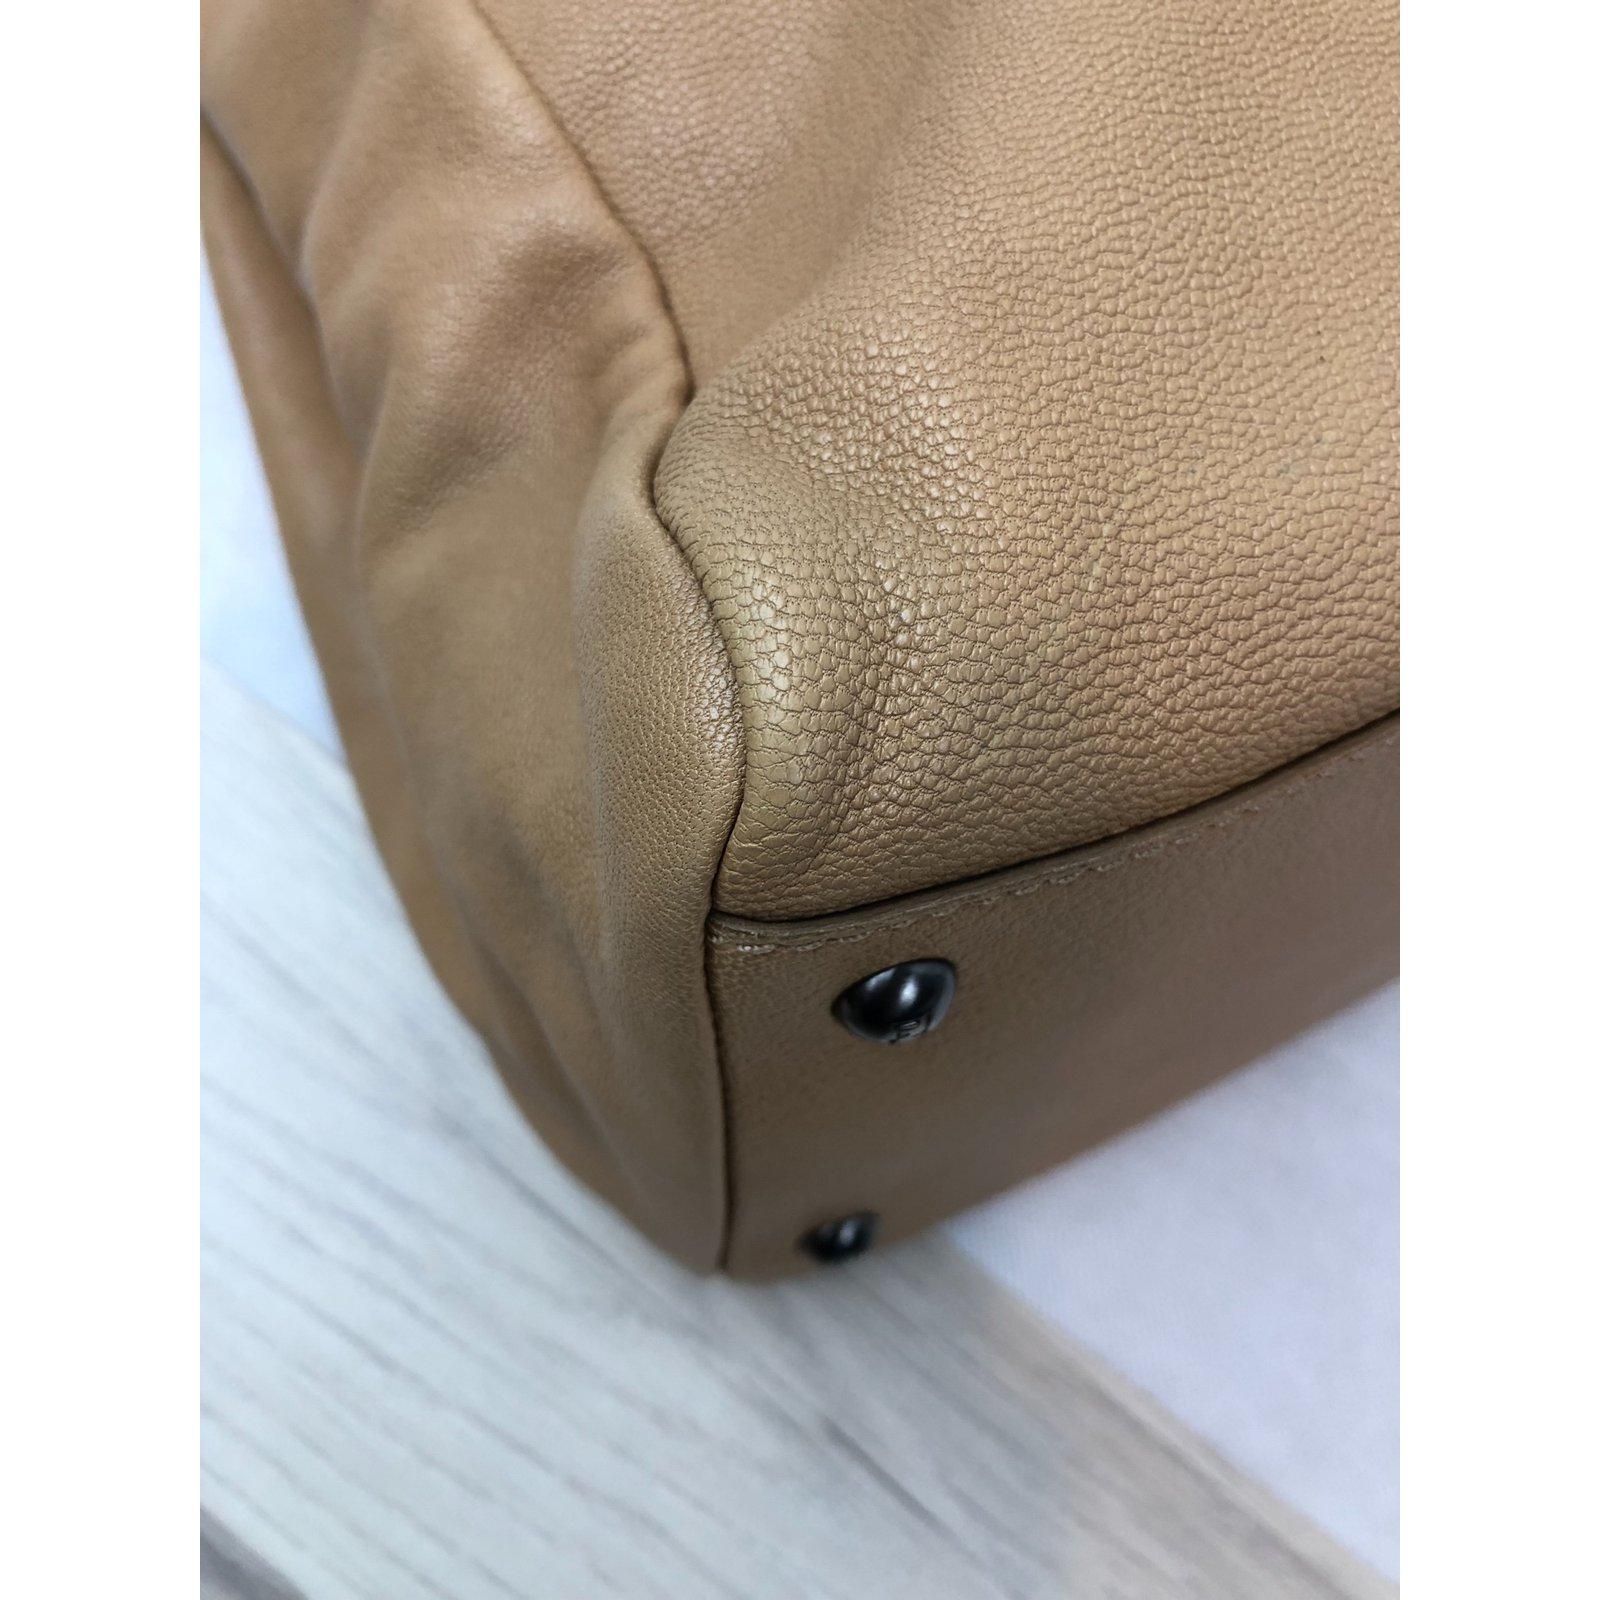 Facebook · Pin This. Fendi PEEKABOO Handbags Leather Beige ref.108892 3dc331aee580e